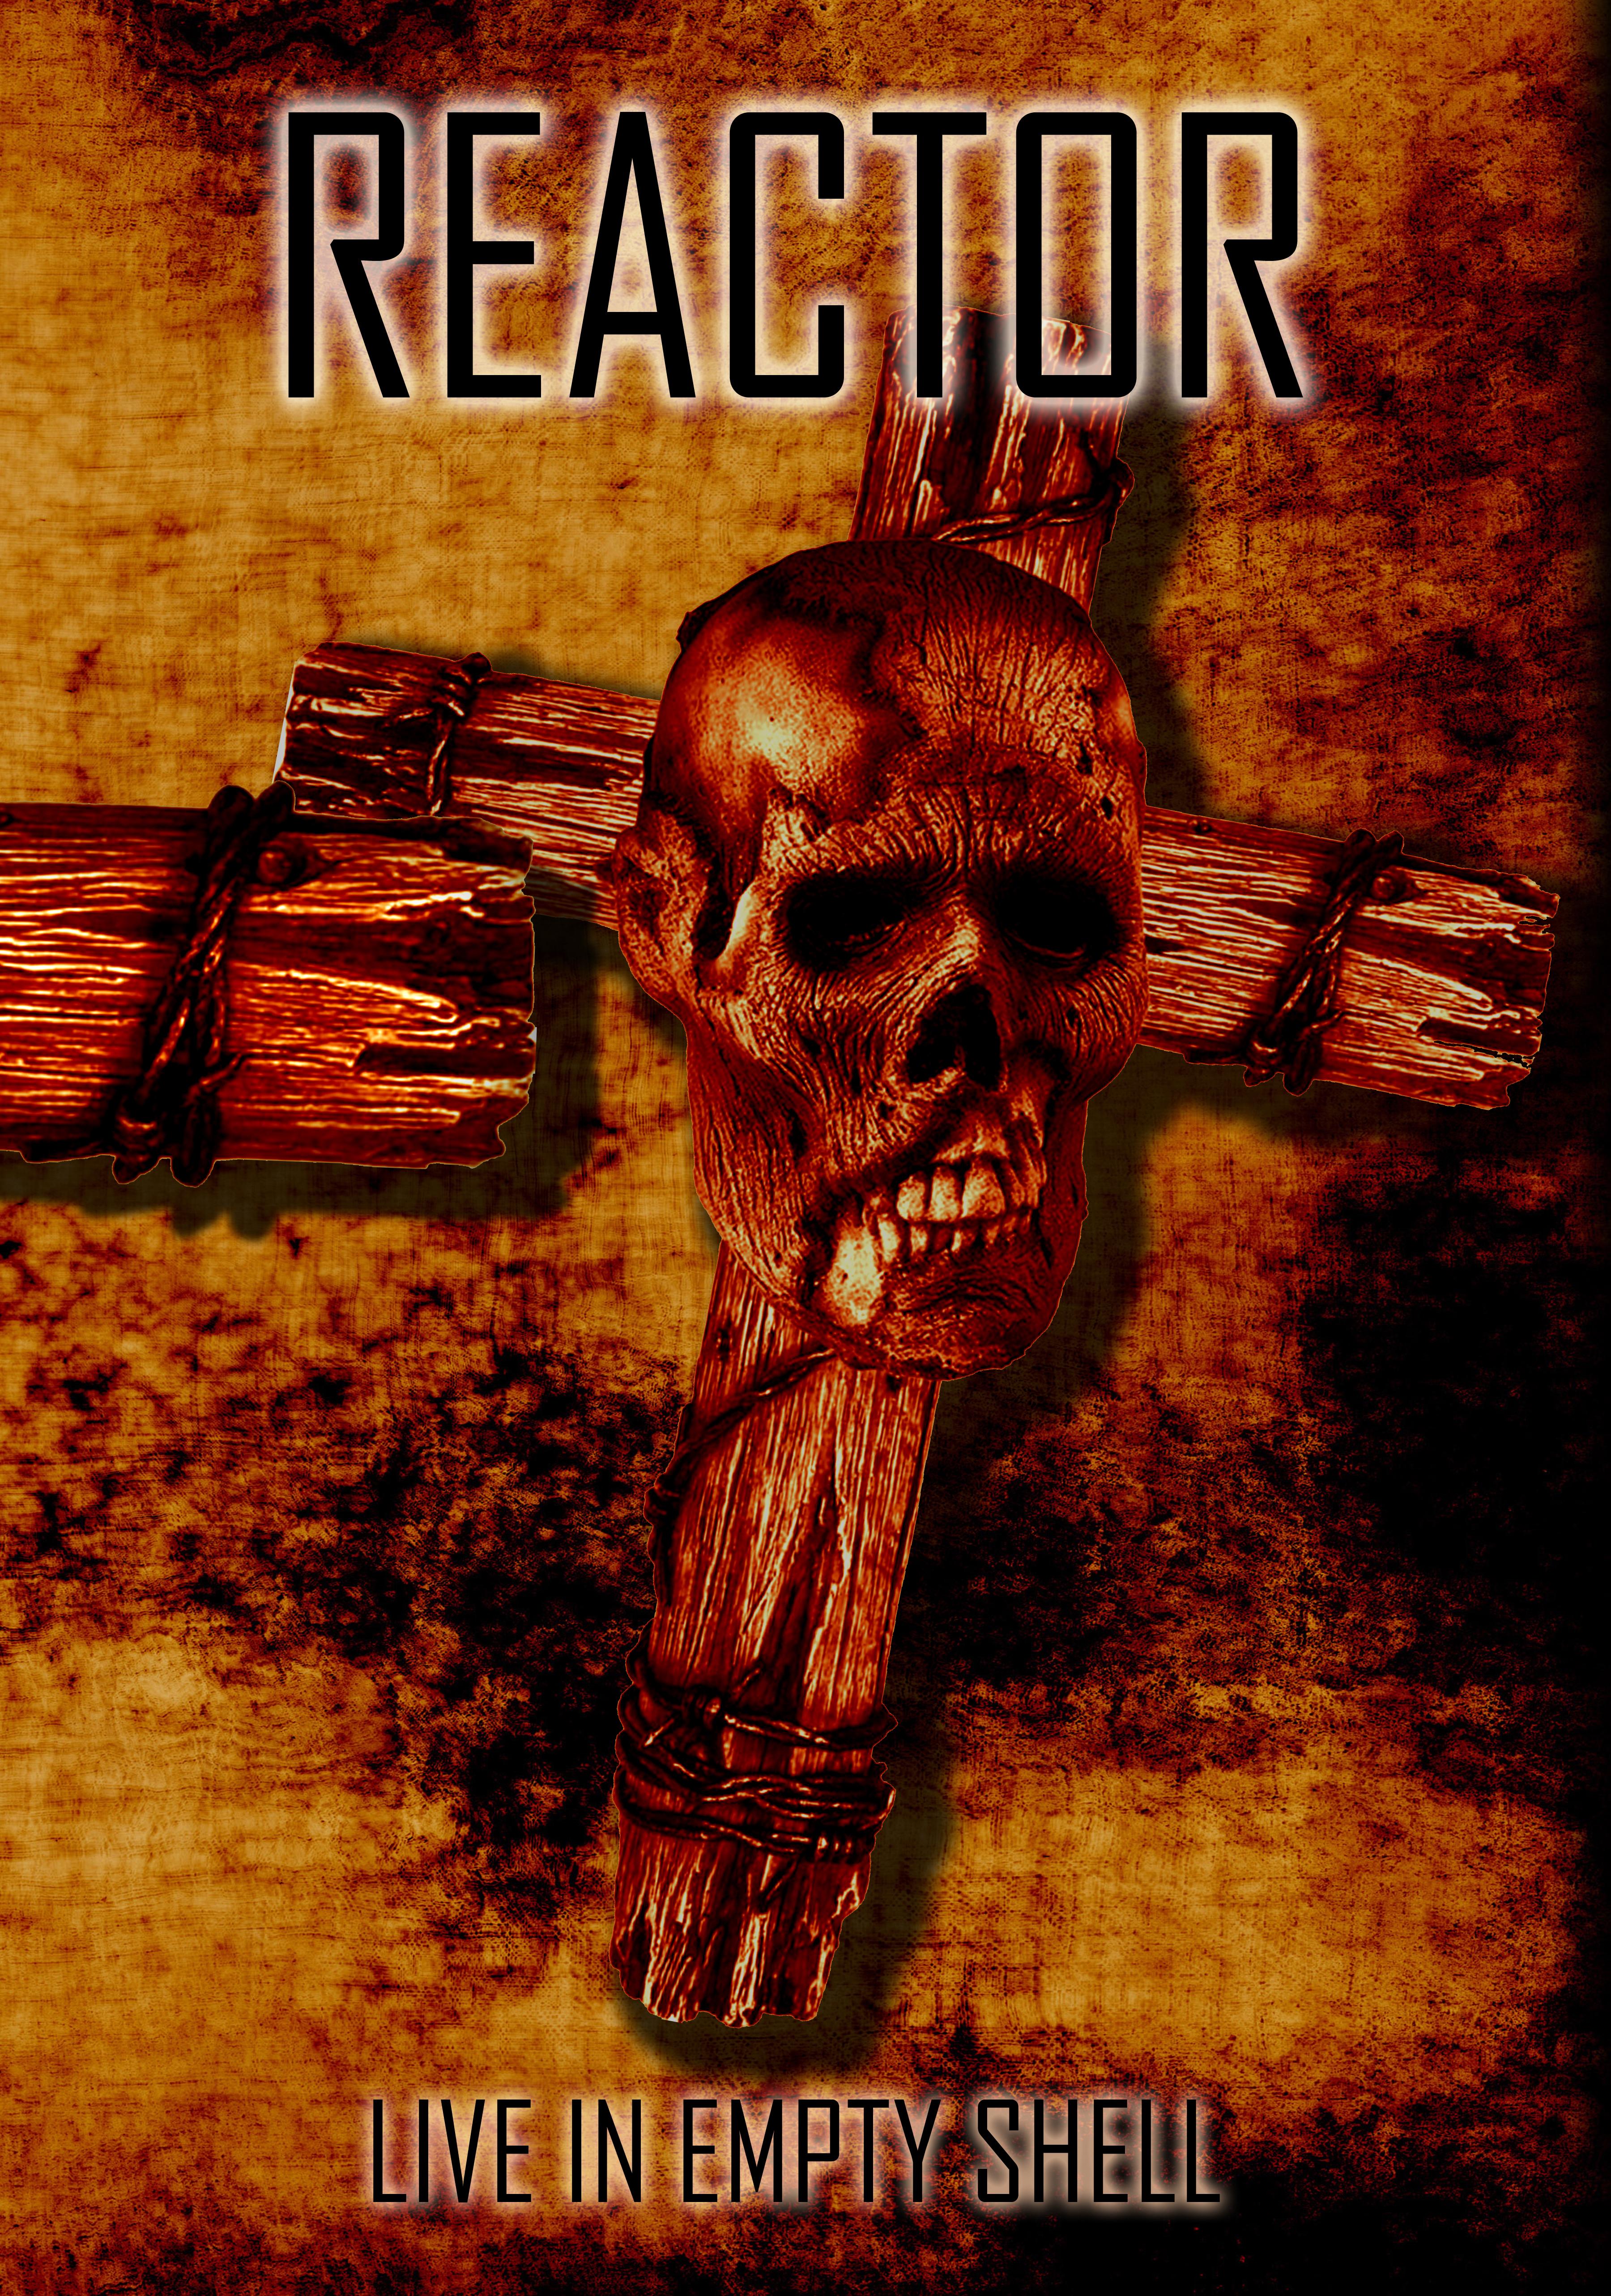 Reactor DVD